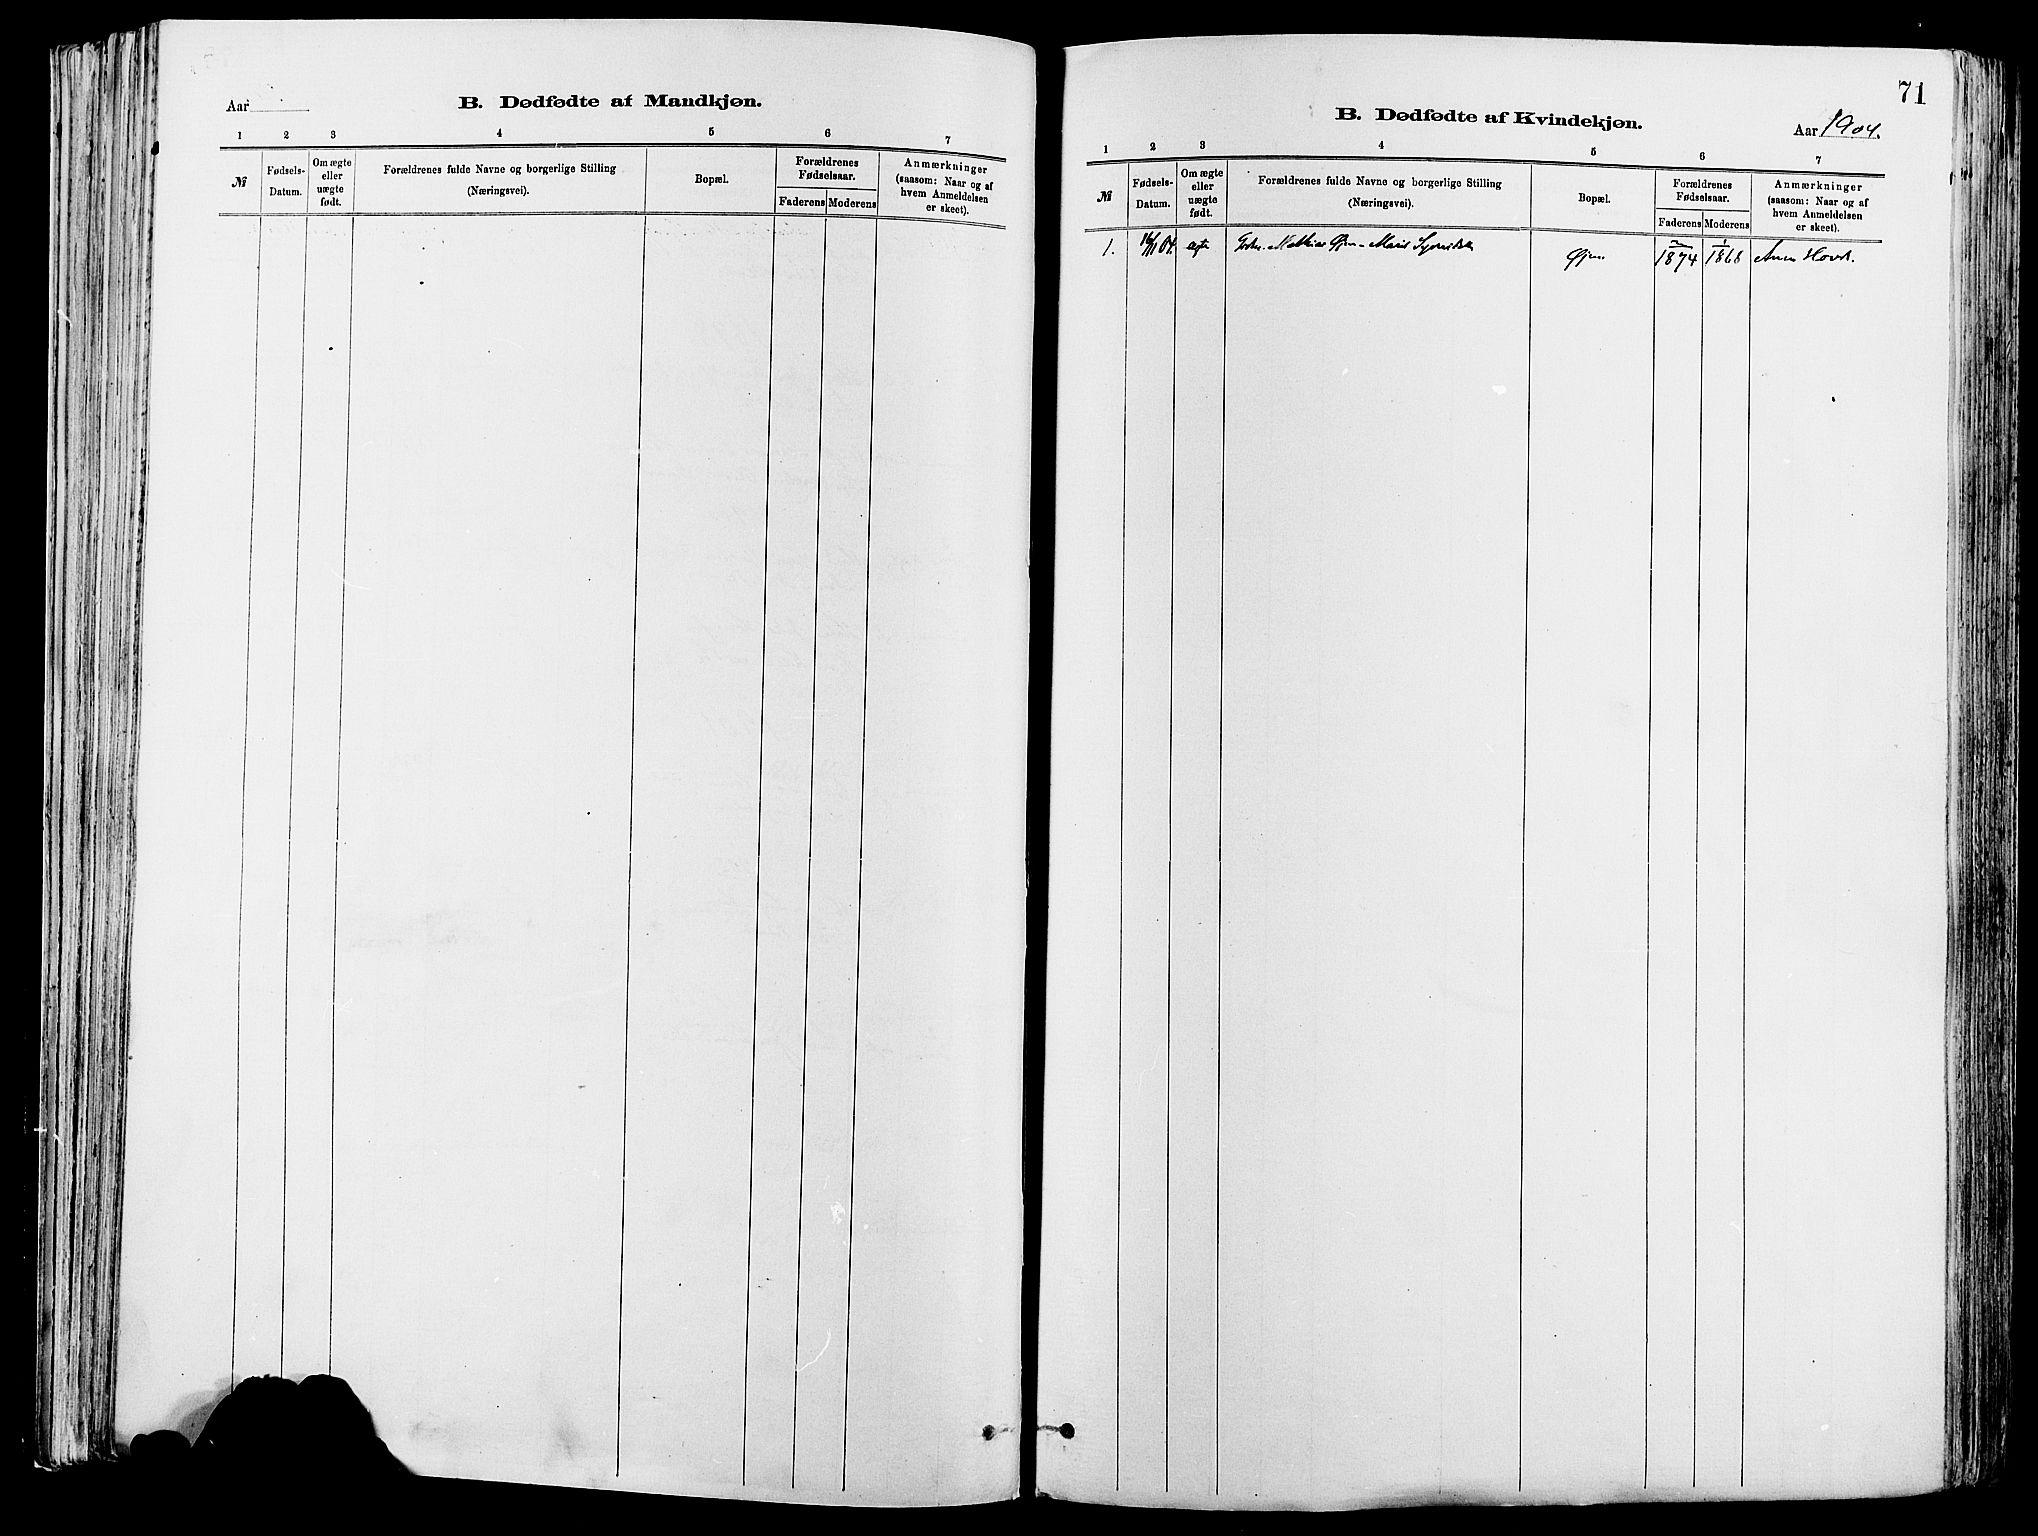 SAH, Vågå prestekontor, Ministerialbok nr. 8, 1886-1904, s. 71